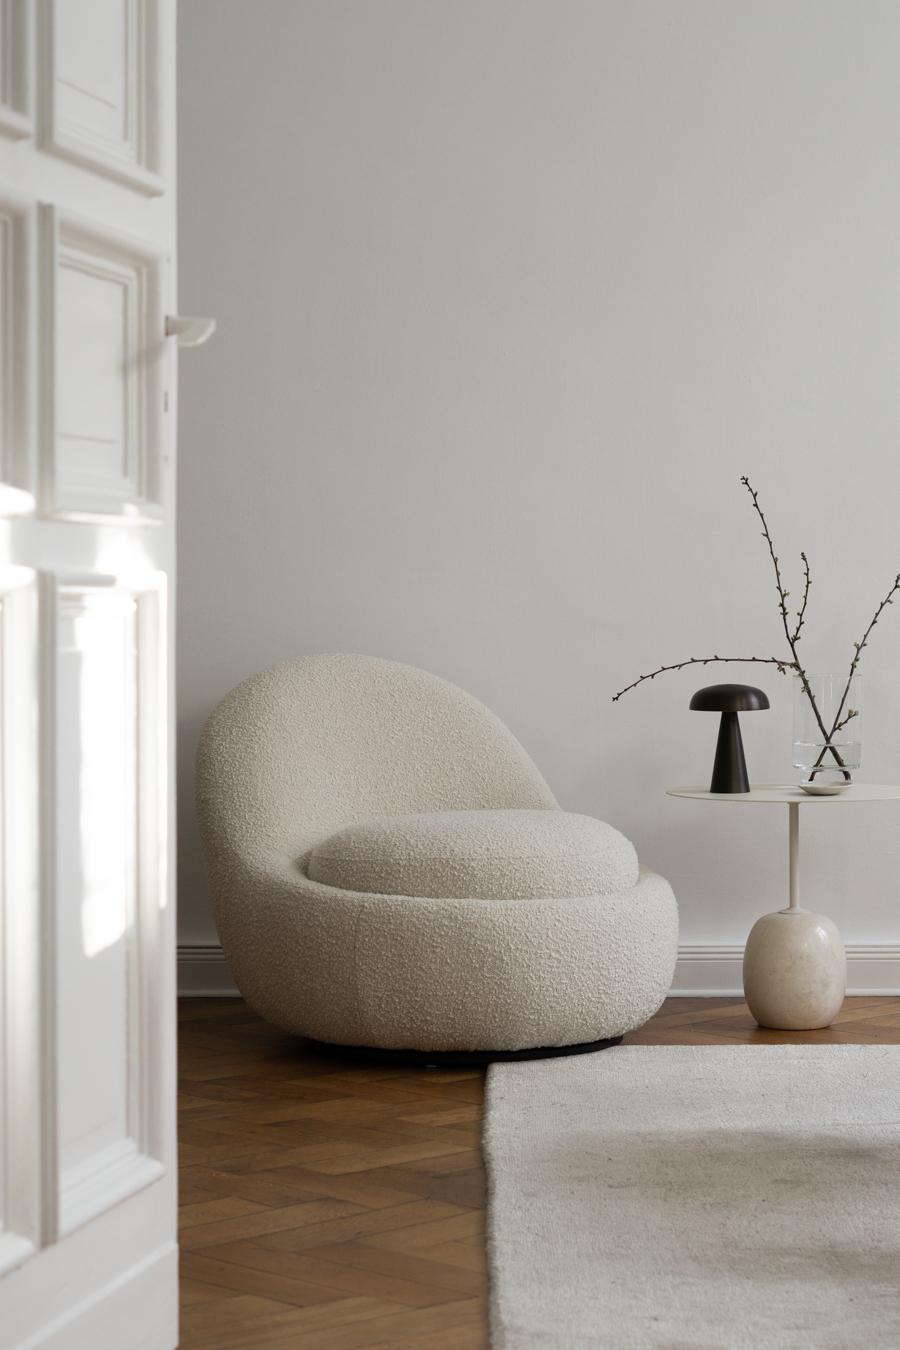 SOFACOMPANY ~ Dreamy Custom Upholstered Designs